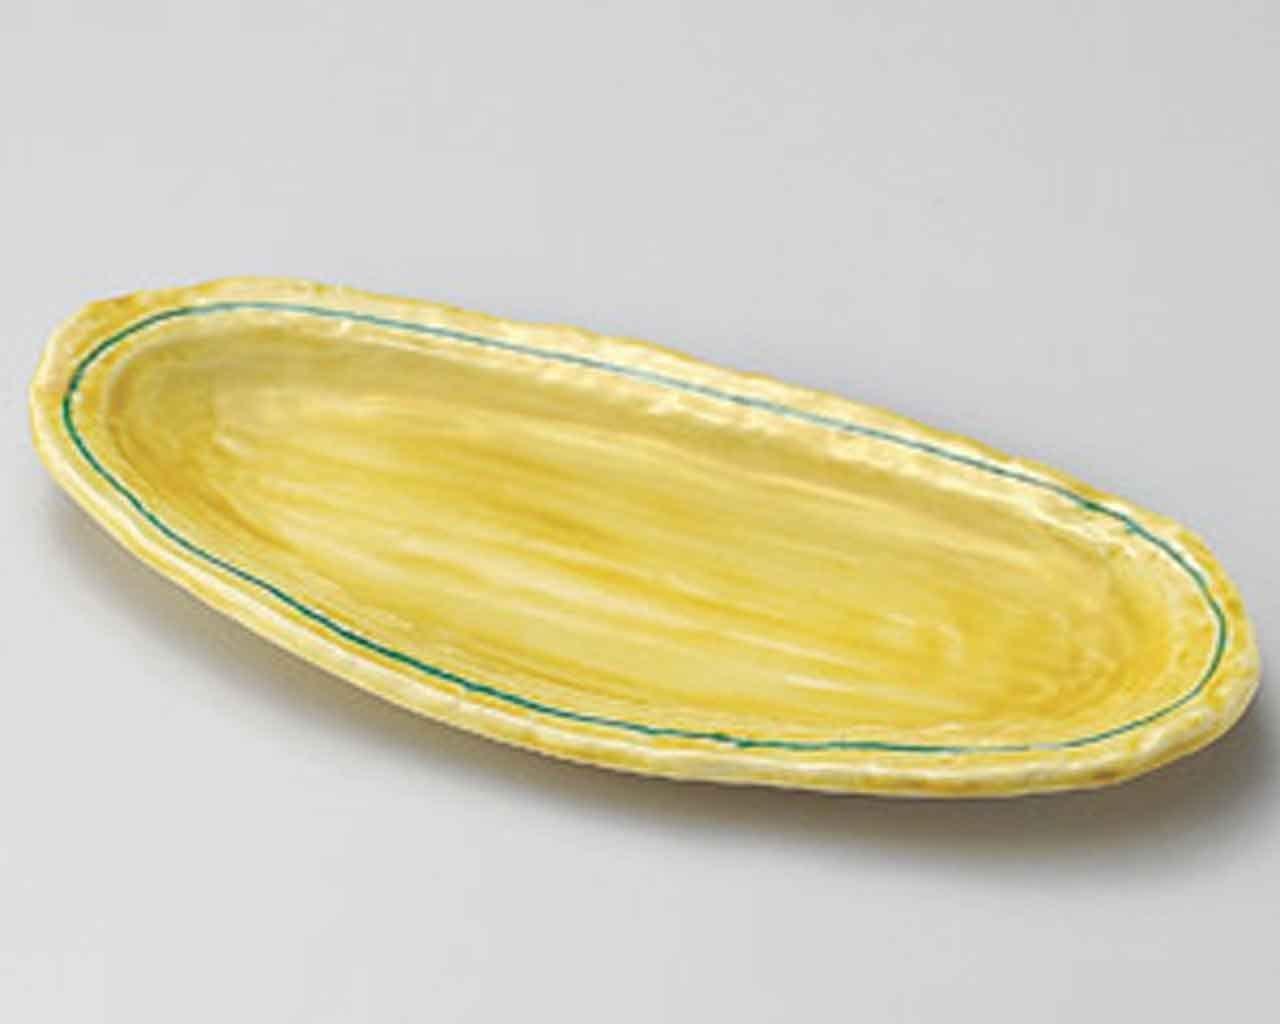 Kohaku Oval 12.2inch Medium Plate Yellow Ceramic Made in Japan